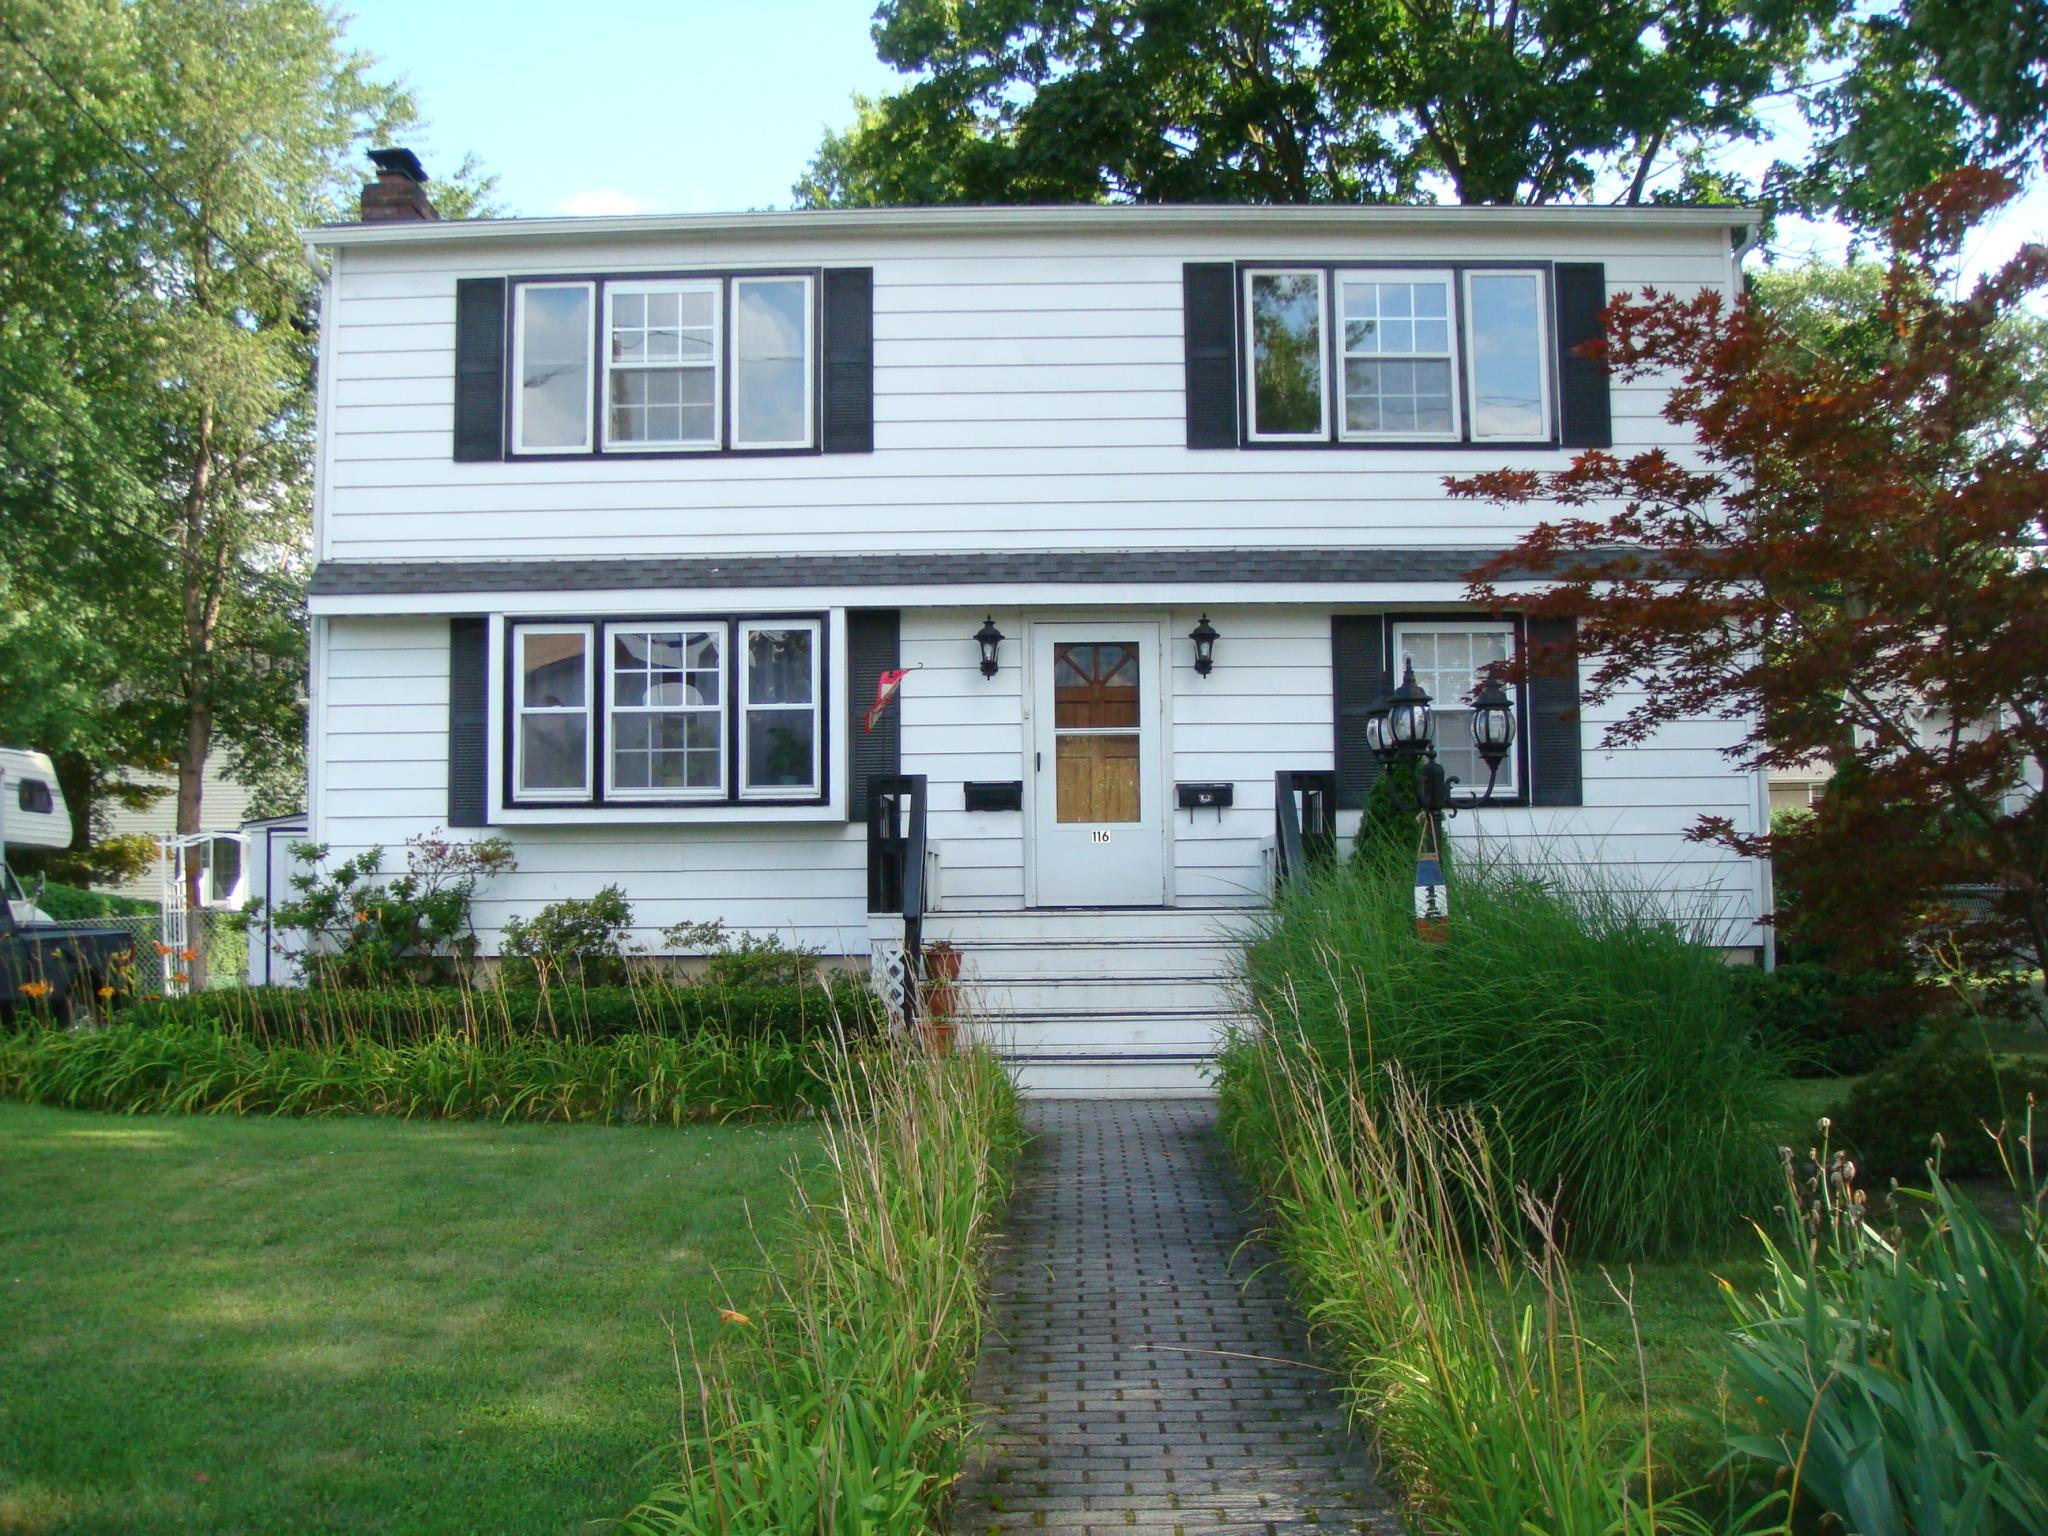 116 Hickory Ave For Rent - Tenafly, NJ | Trulia